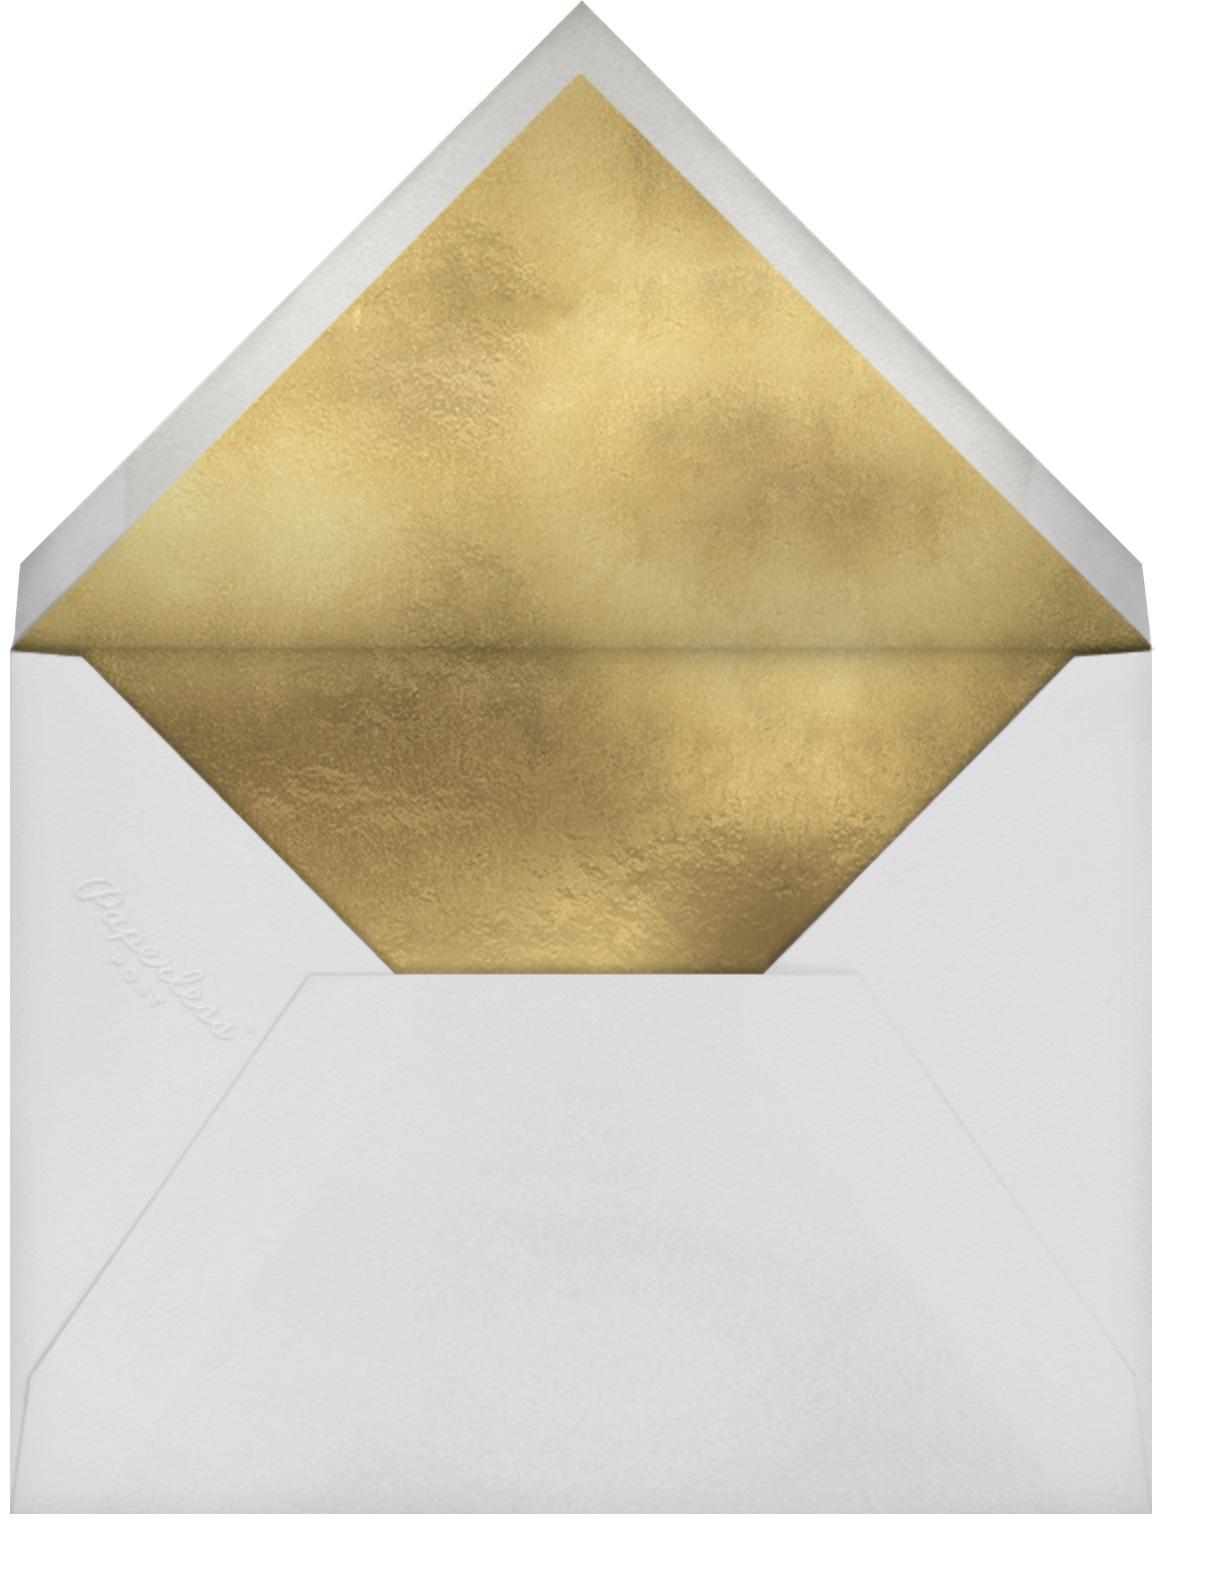 Fetti (Square) - Kelly Wearstler - Save the date - envelope back